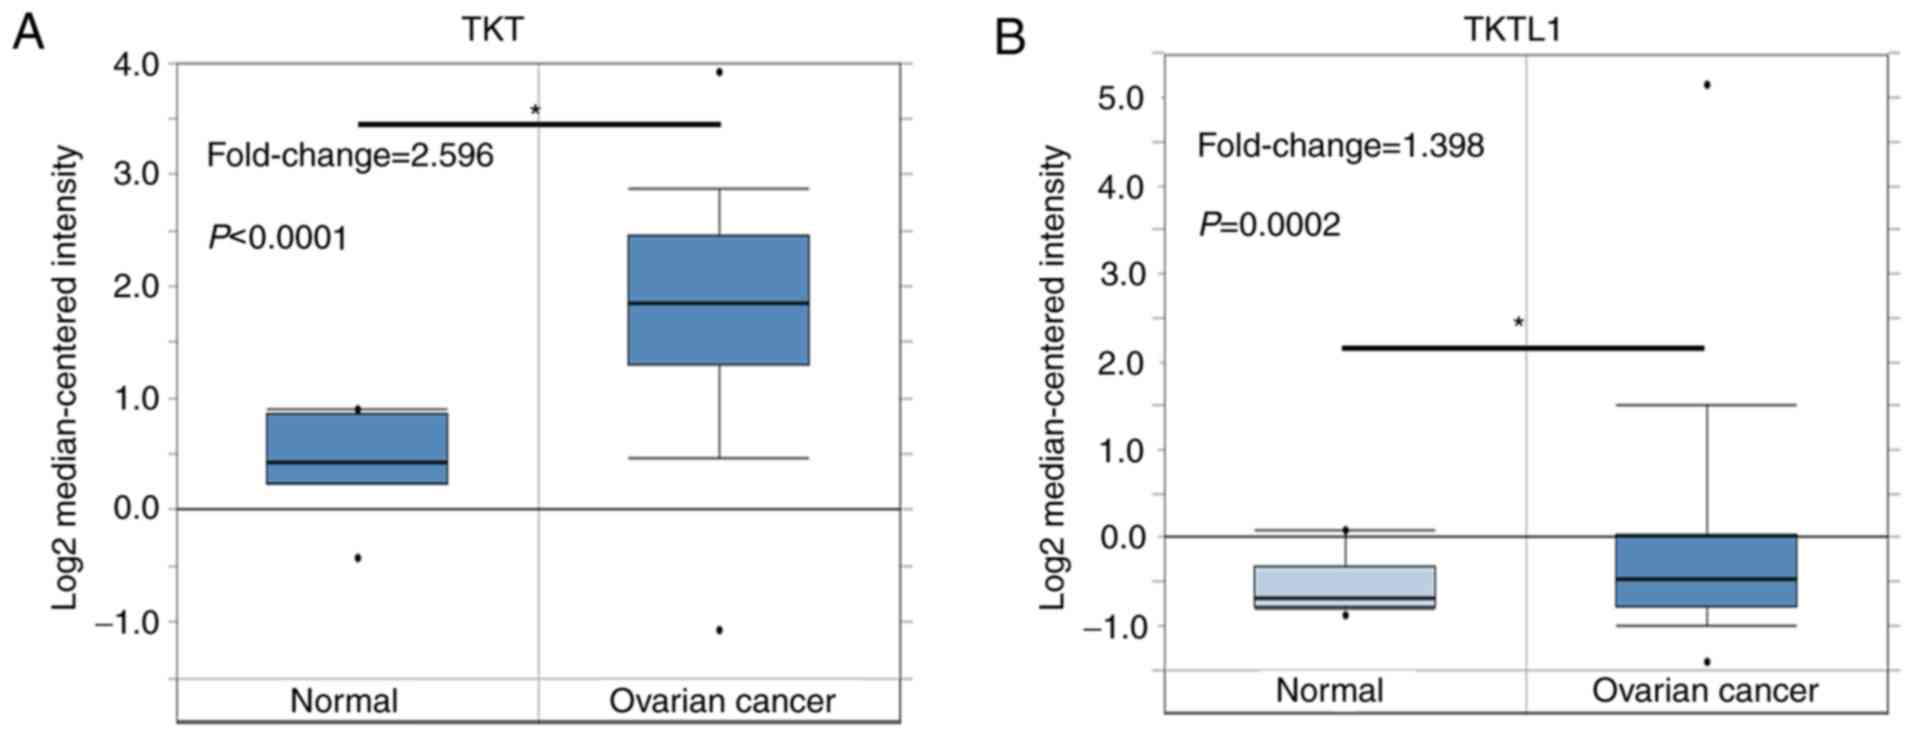 Prognostic Values Of Transketolase Family Genes In Ovarian Cancer